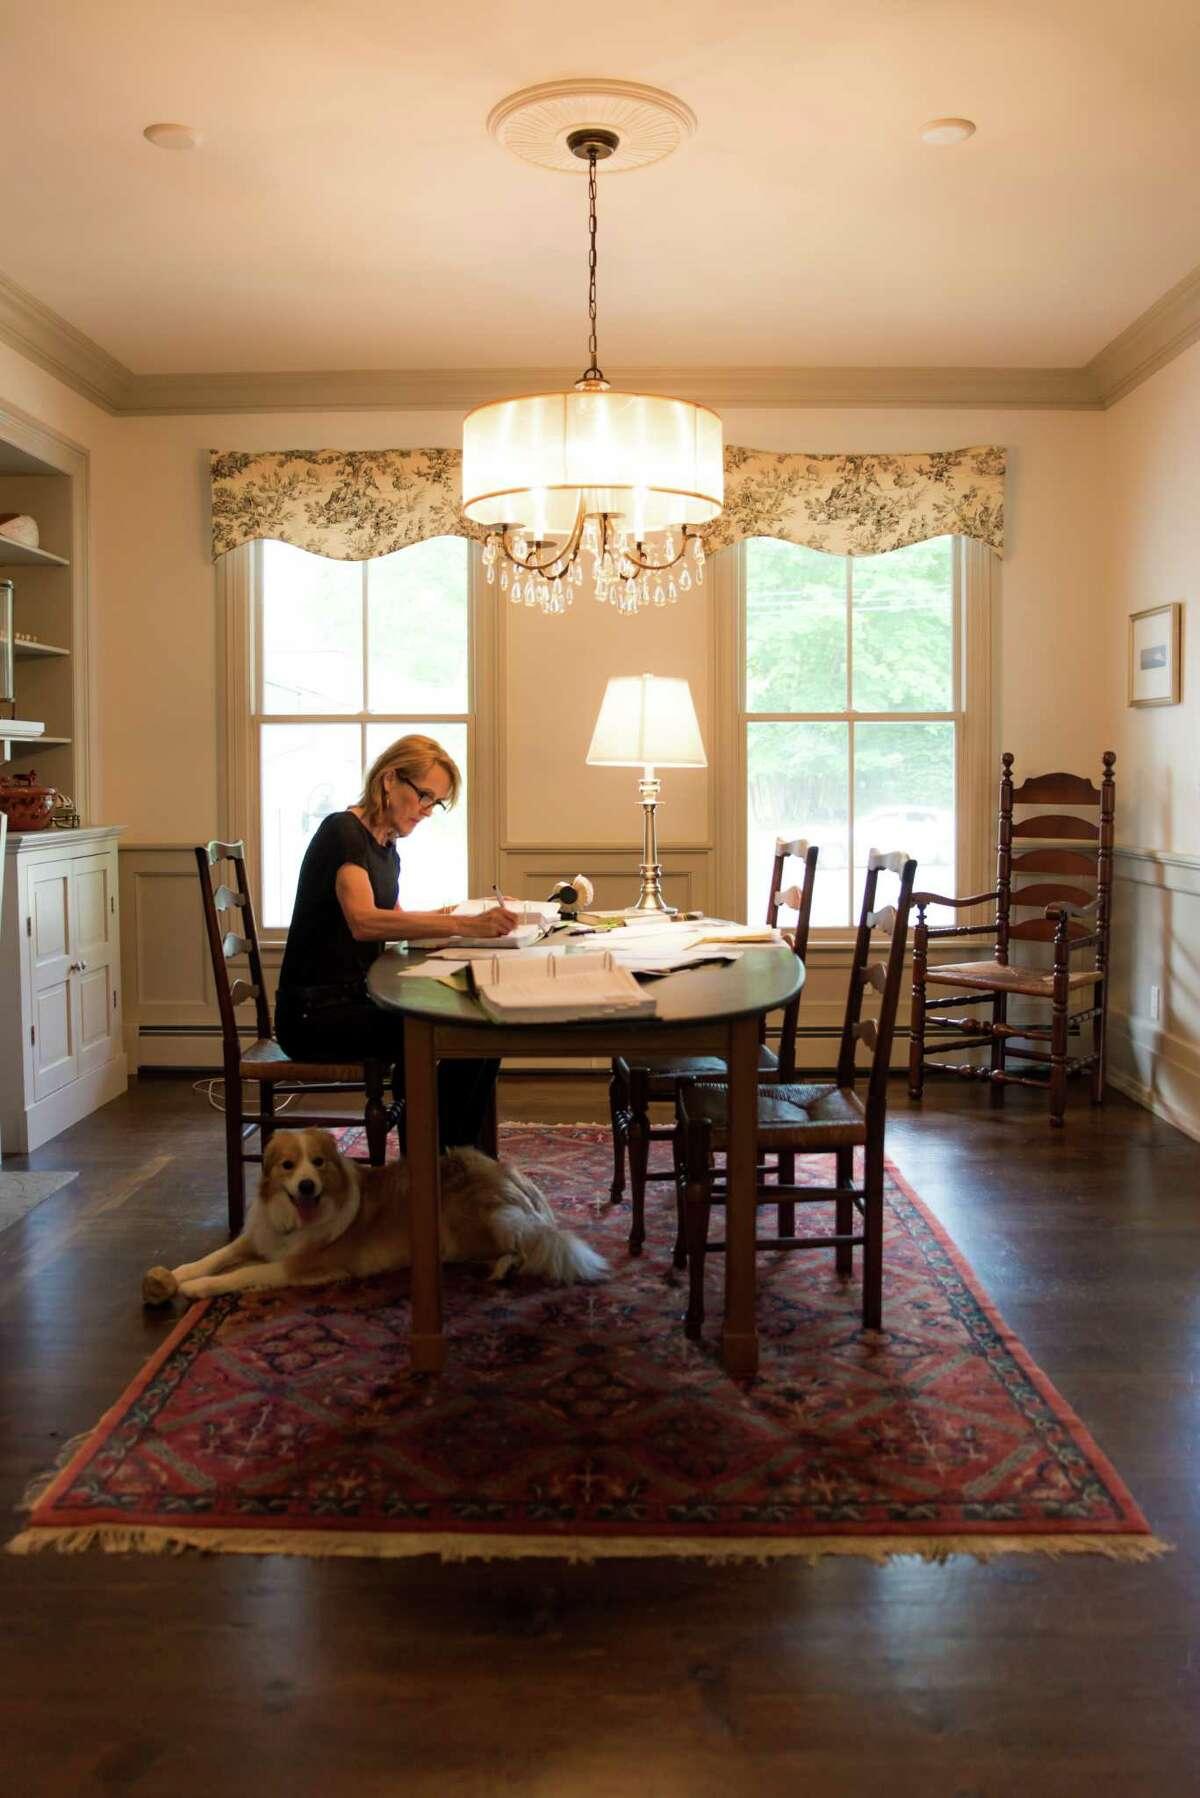 Author Charlotte Rogan at work in her home in Westport.